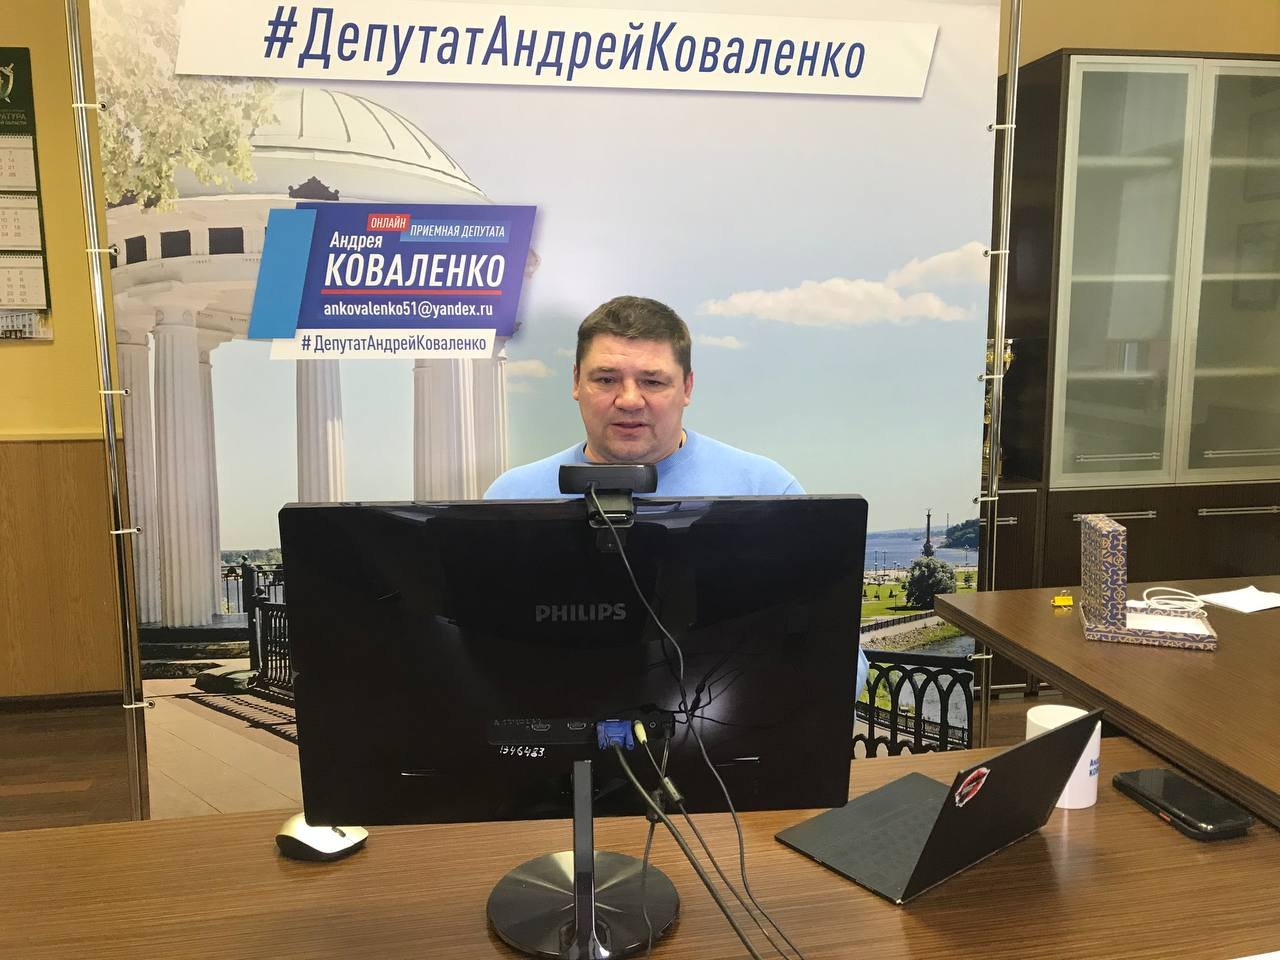 Депутат Андрей Коваленко провел онлайн-конференцию с ярославцами